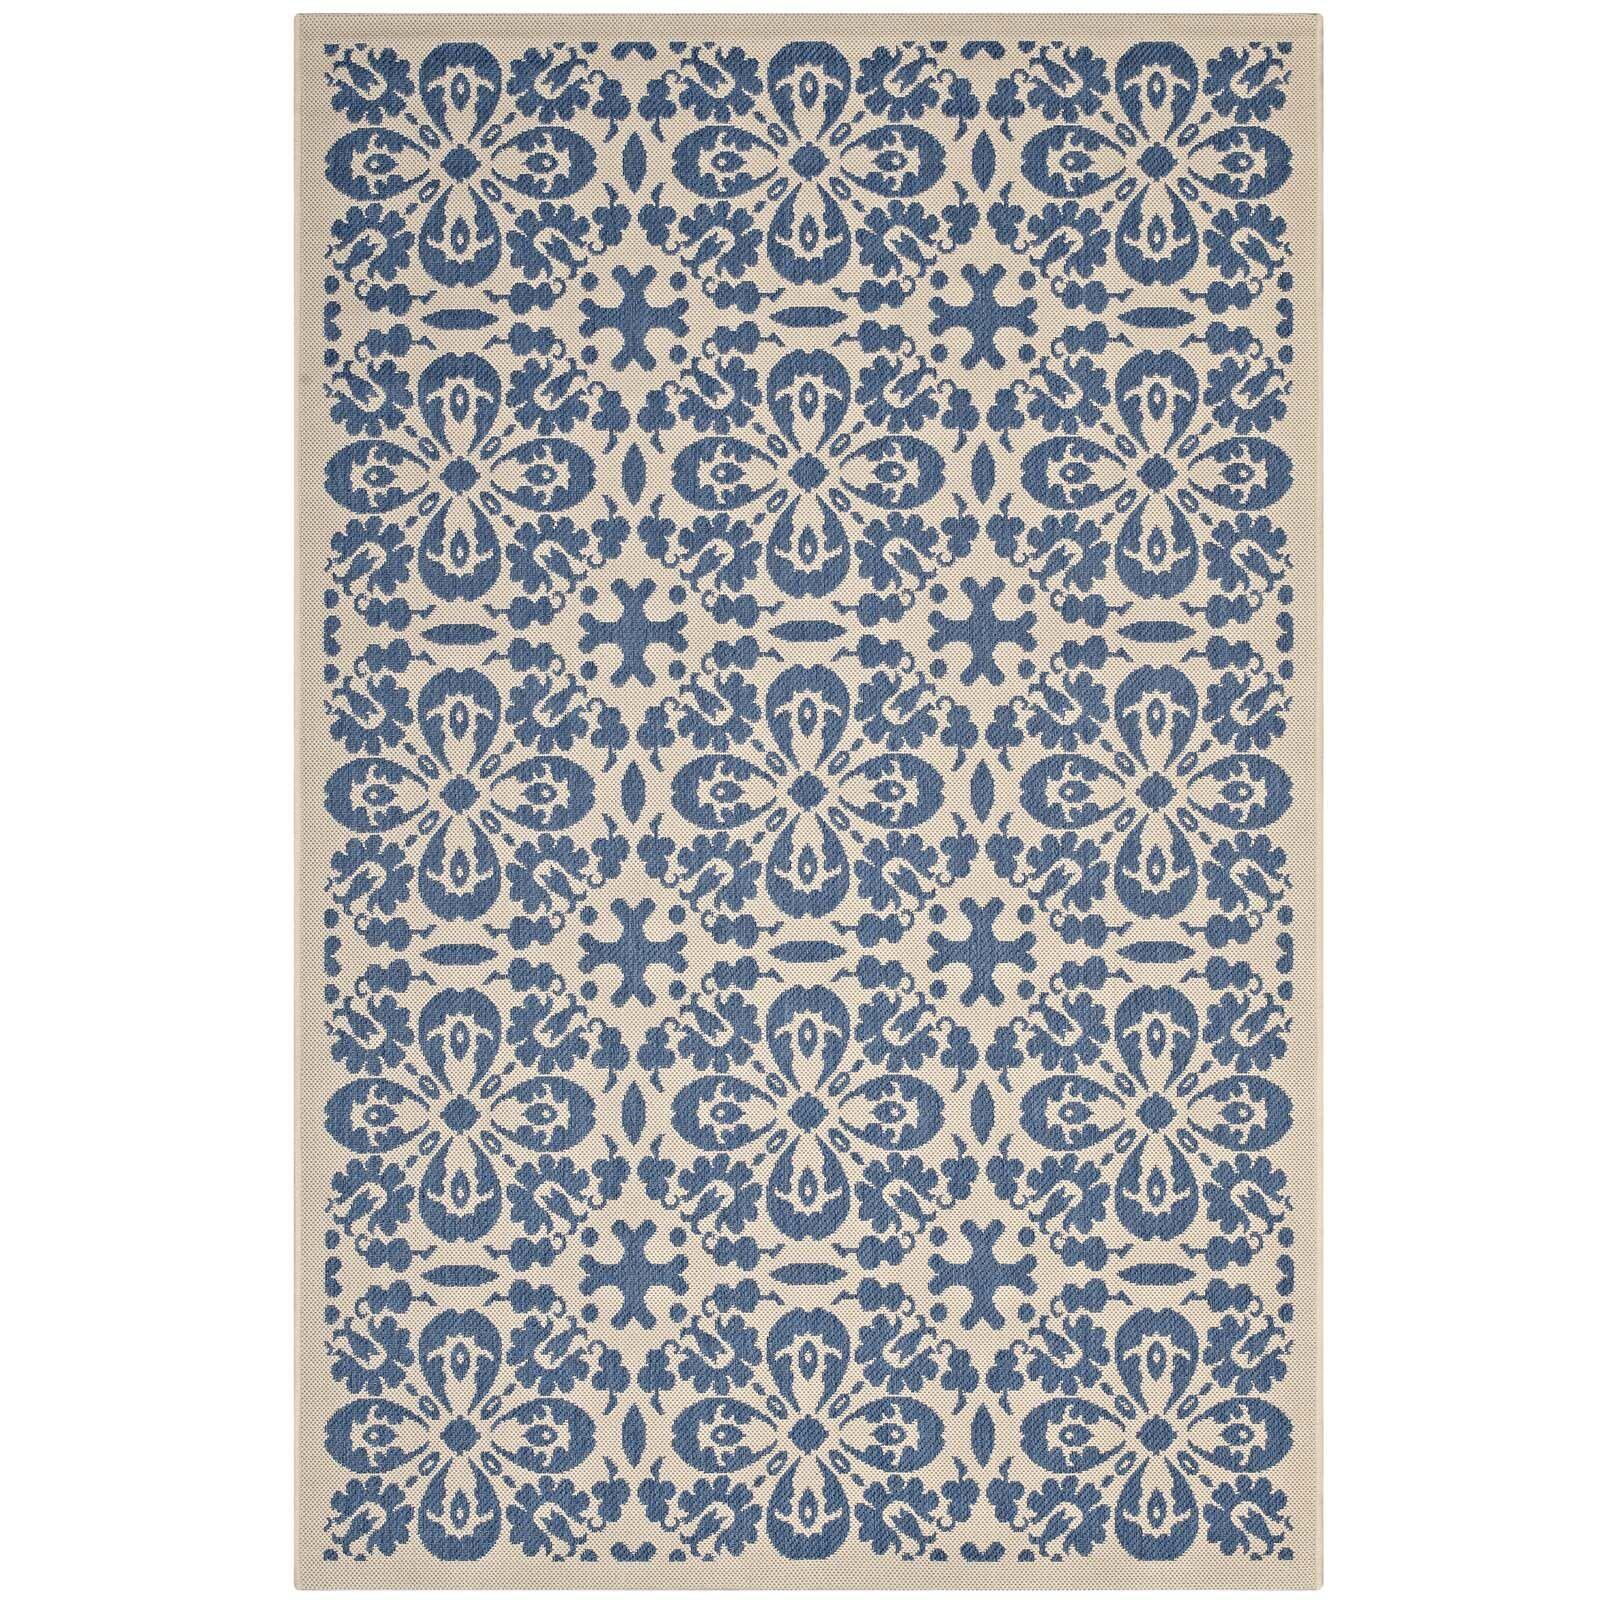 Herzberg Vintage Floral Blue/Beige Indoor/Outdoor Area Rug Rug Size: Rectangle 8' x 10'